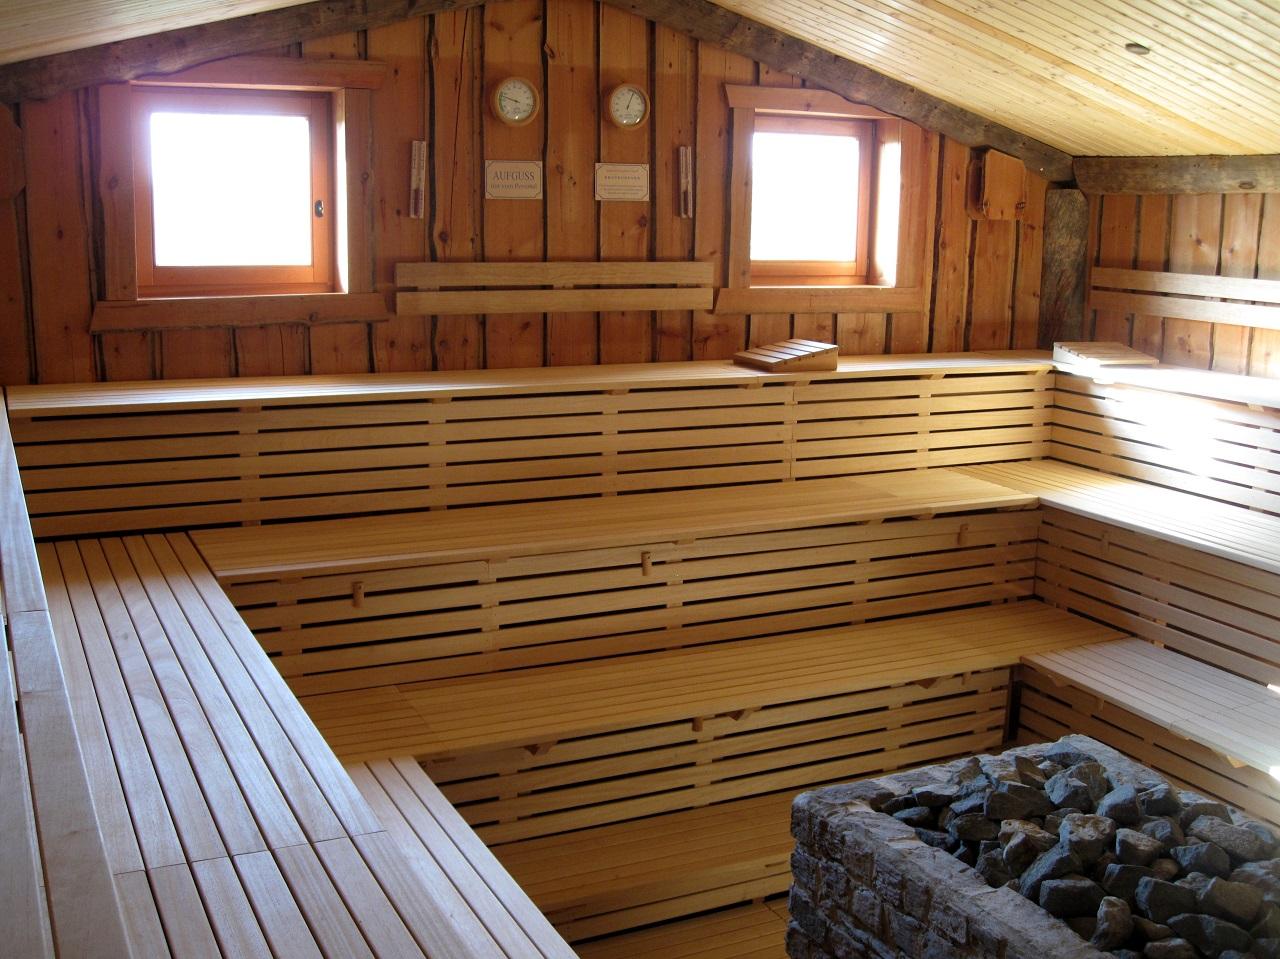 Comment entretenir son sauna?